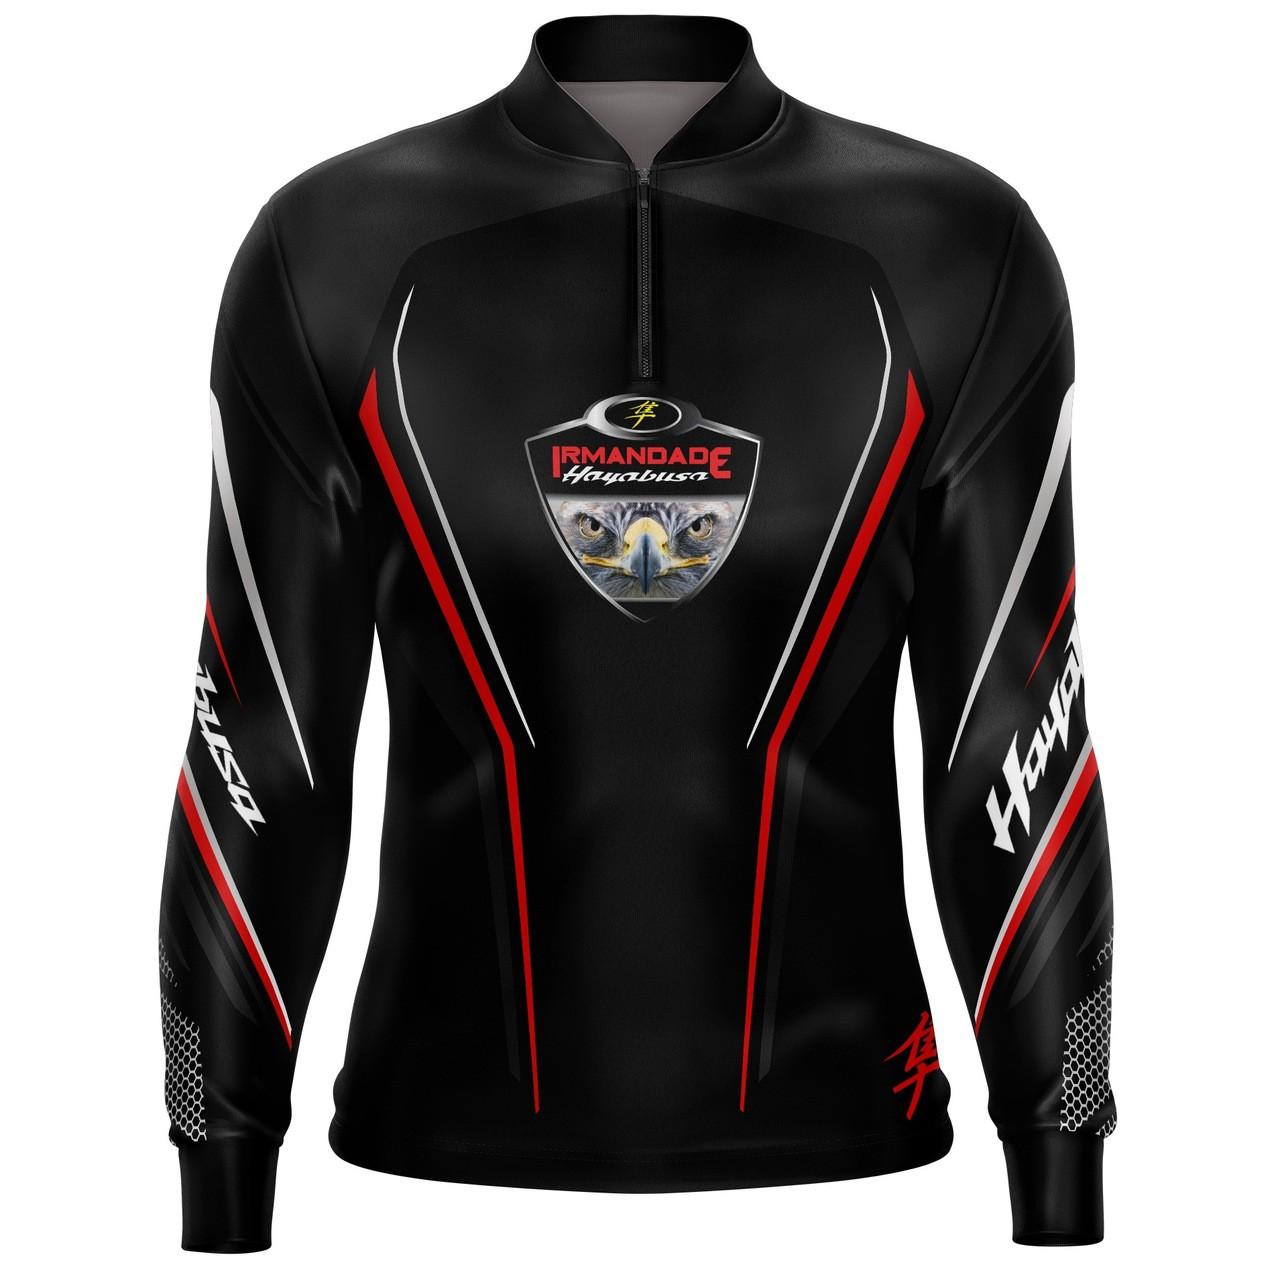 Camiseta Brk Motociclismo Irmandade Hayabusa Black fps 50+